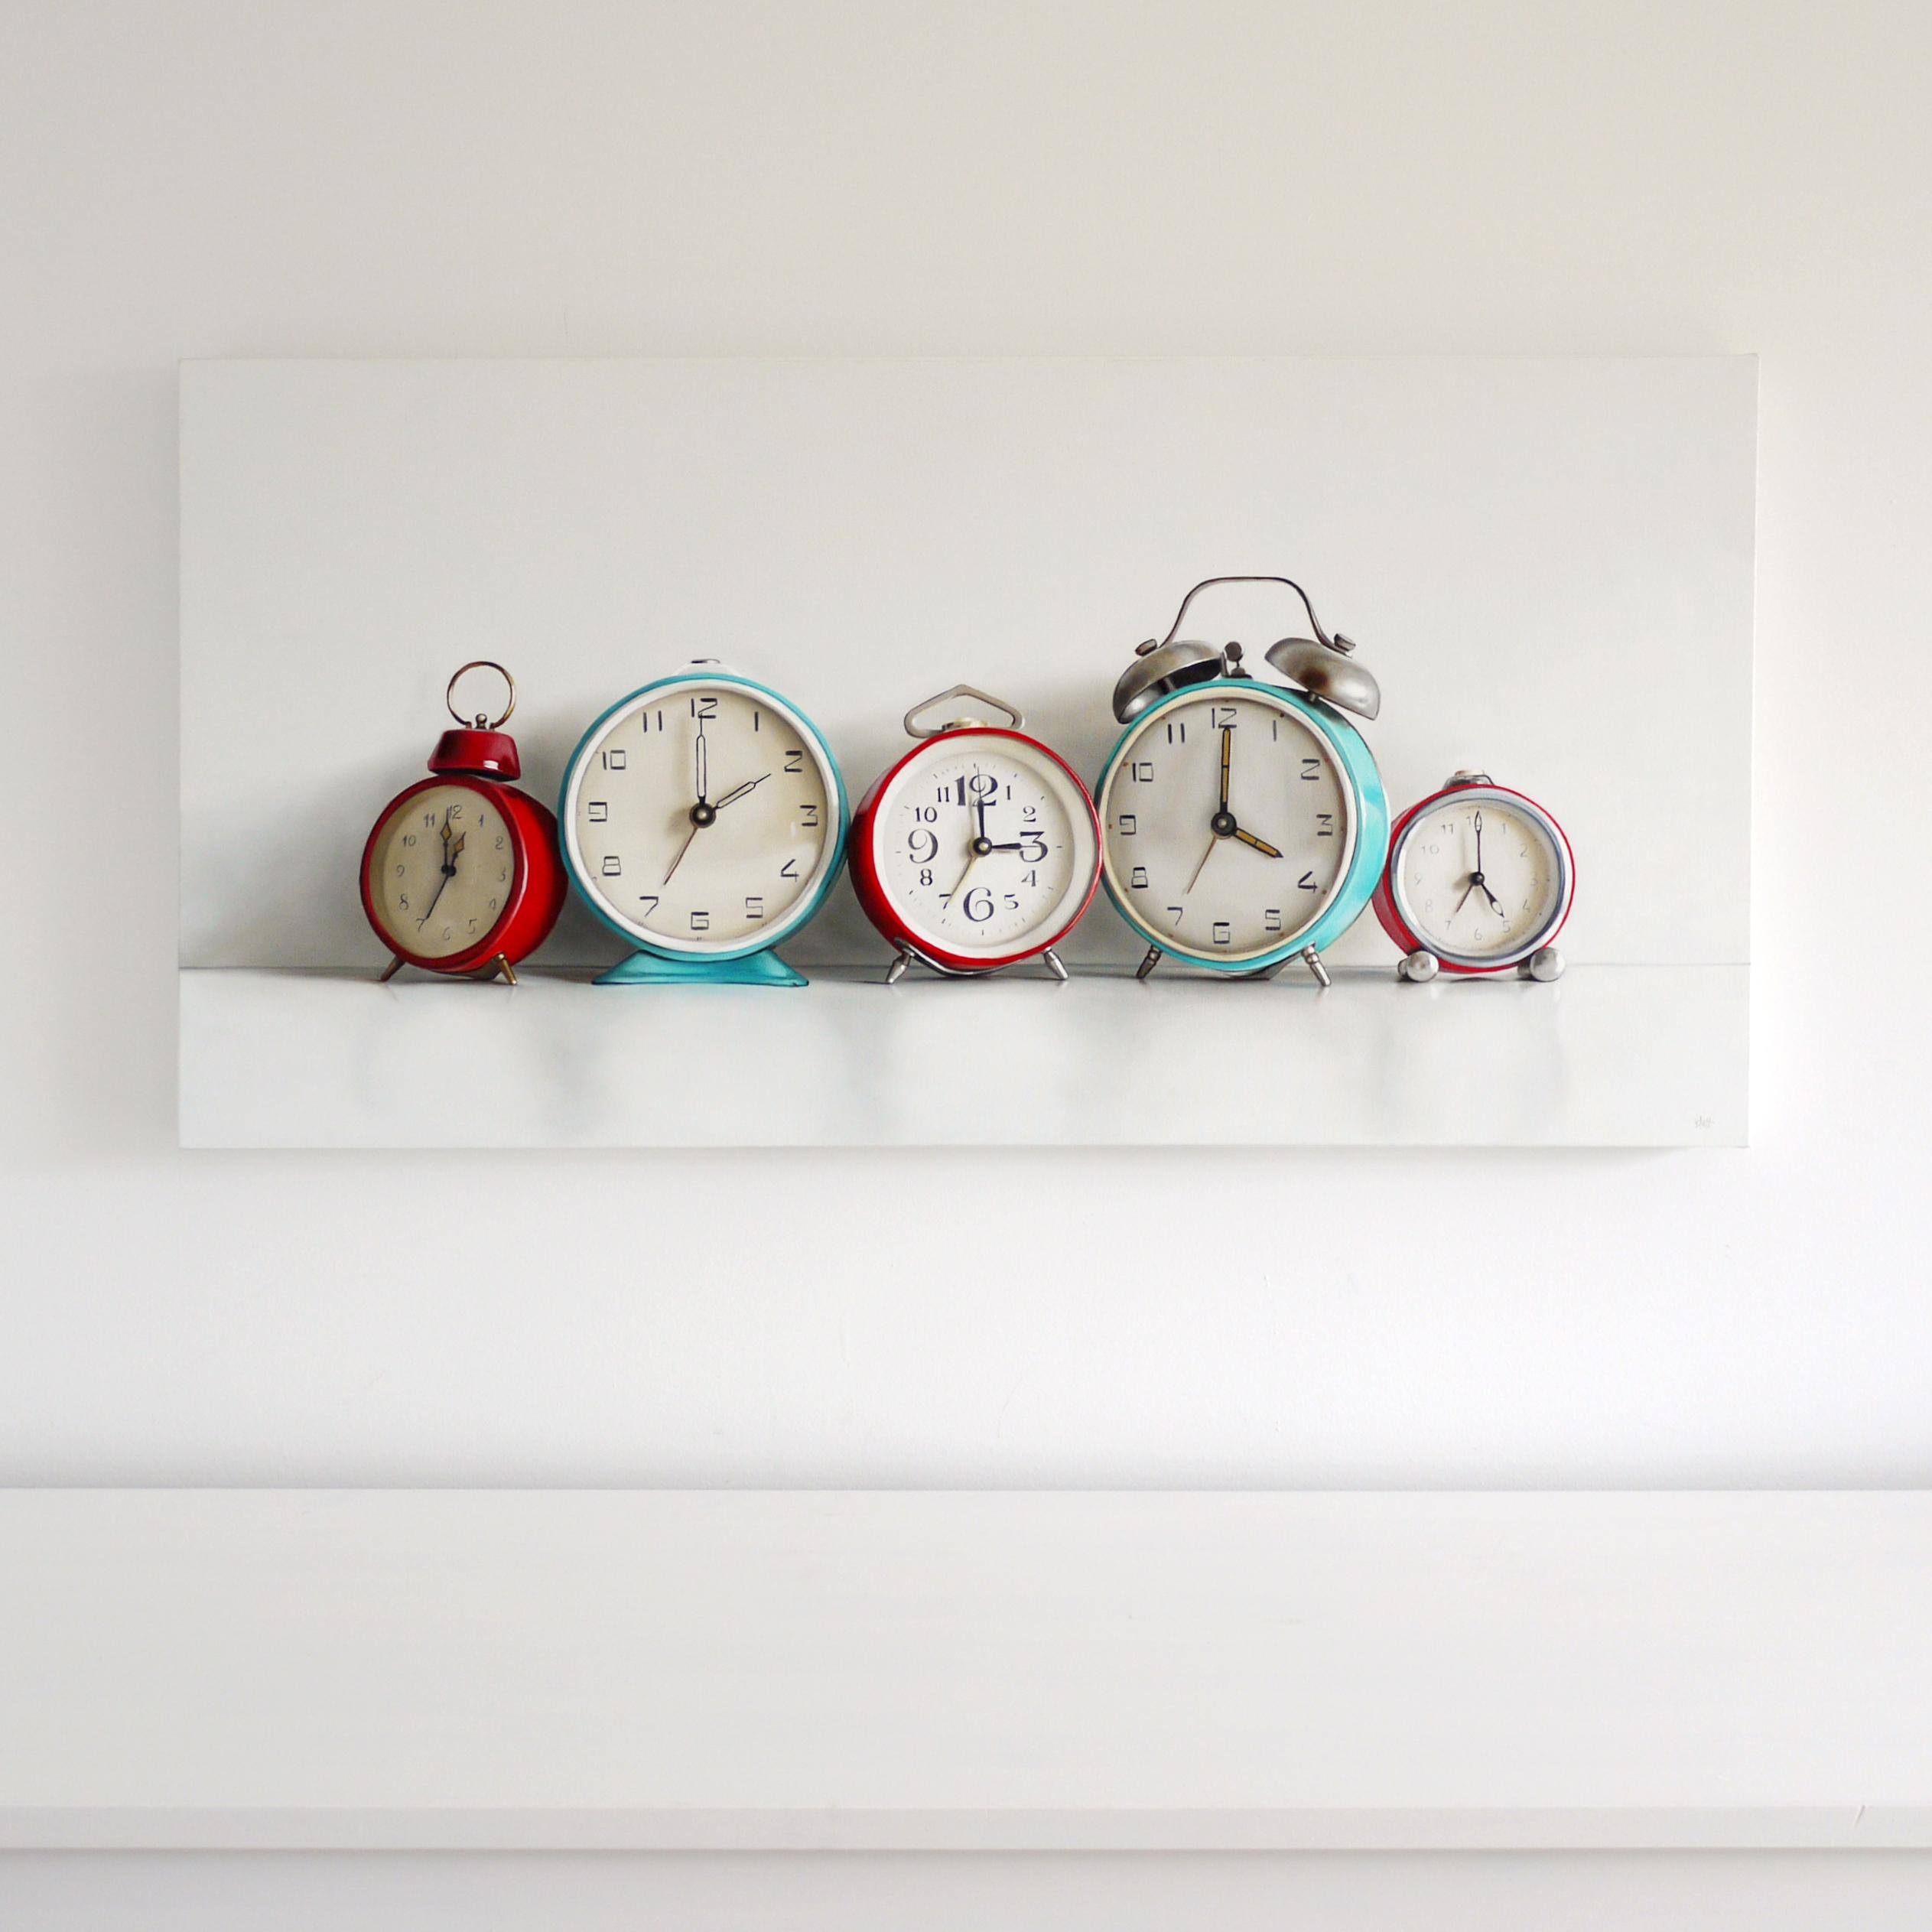 Five Vintage Alarm Clocks / 18 x 36